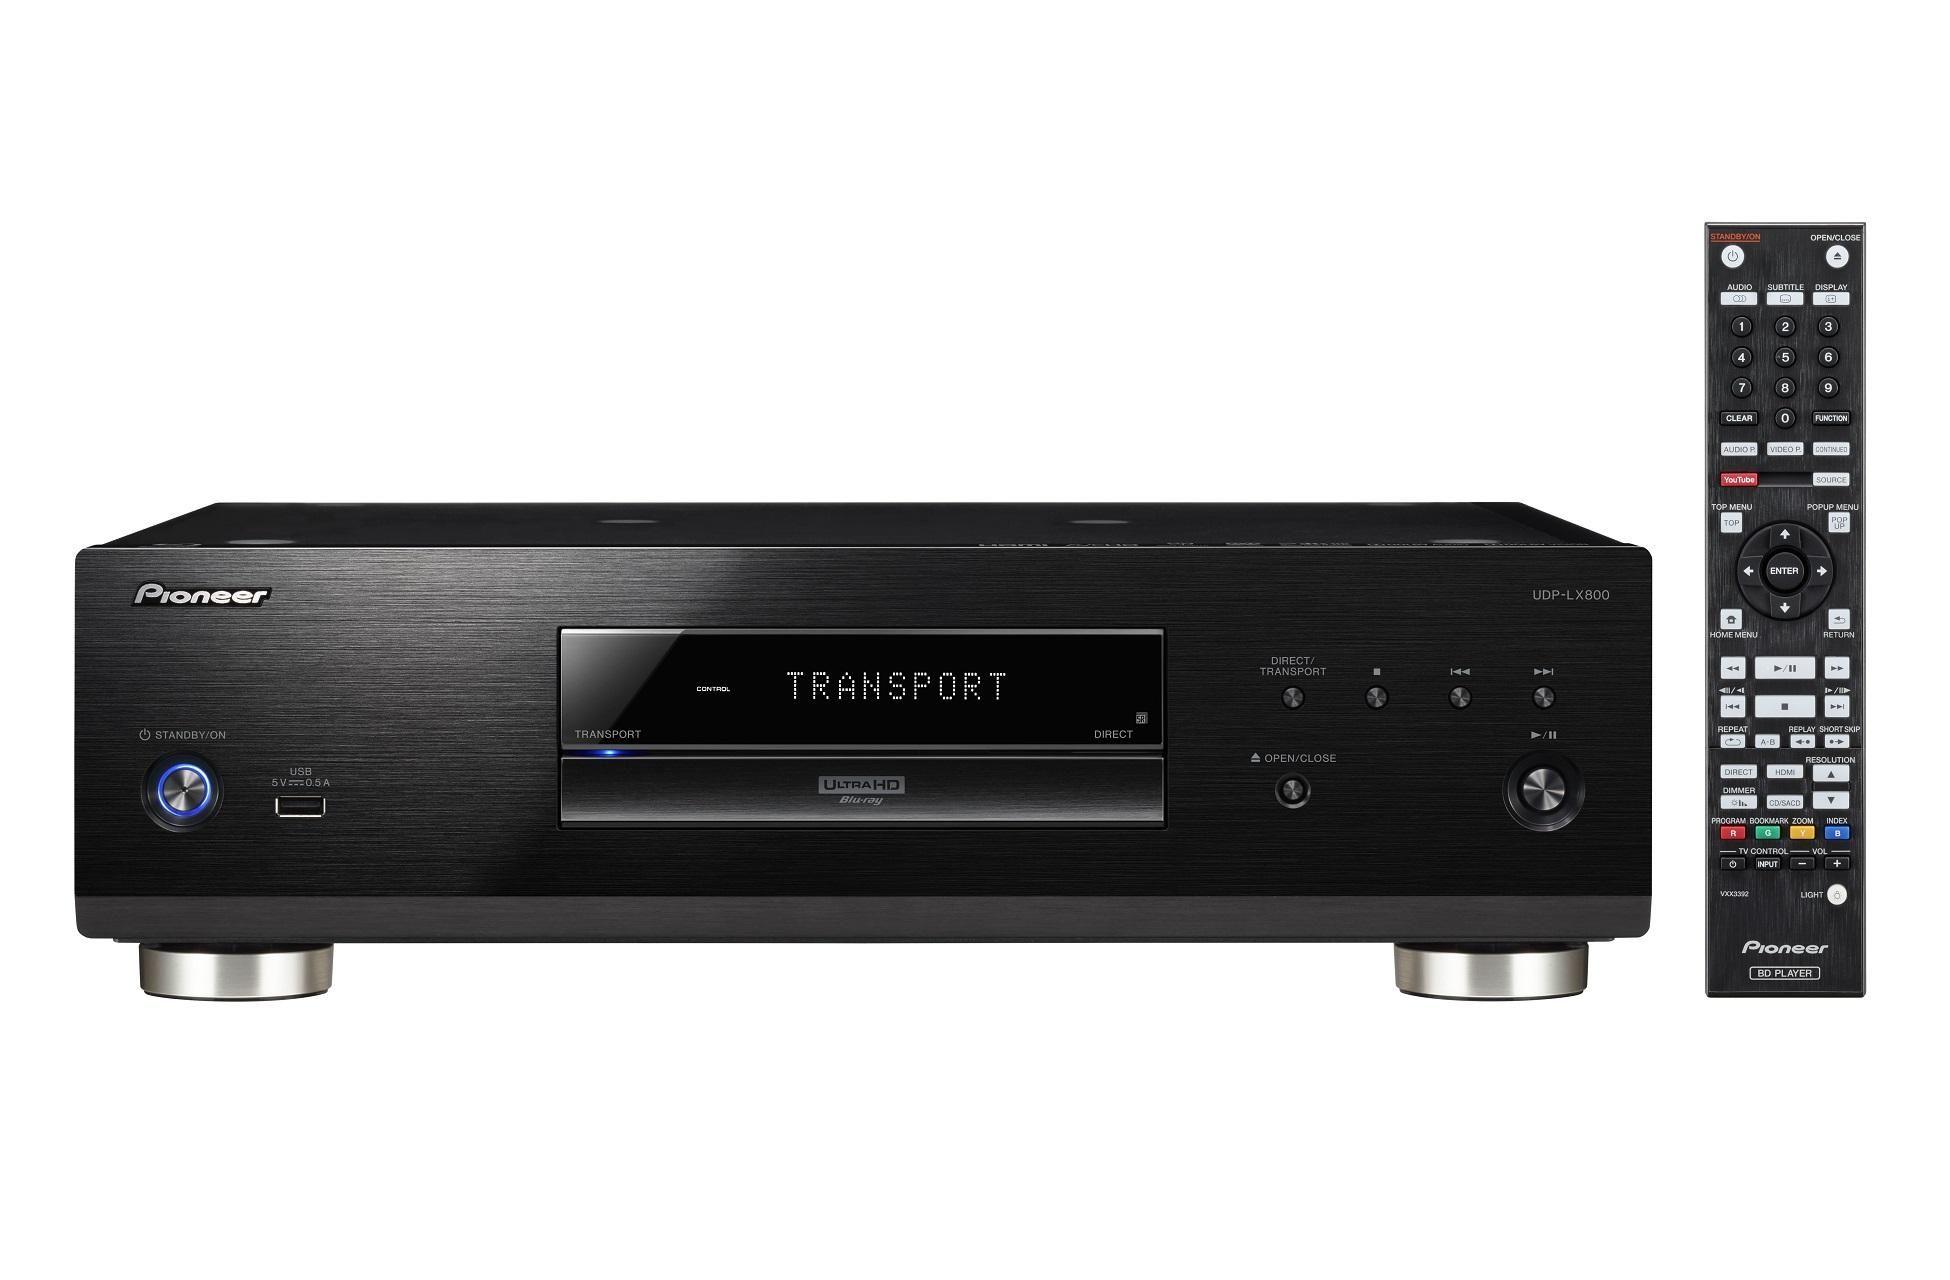 pioneer udp lx800 4k uhd blu ray player home media